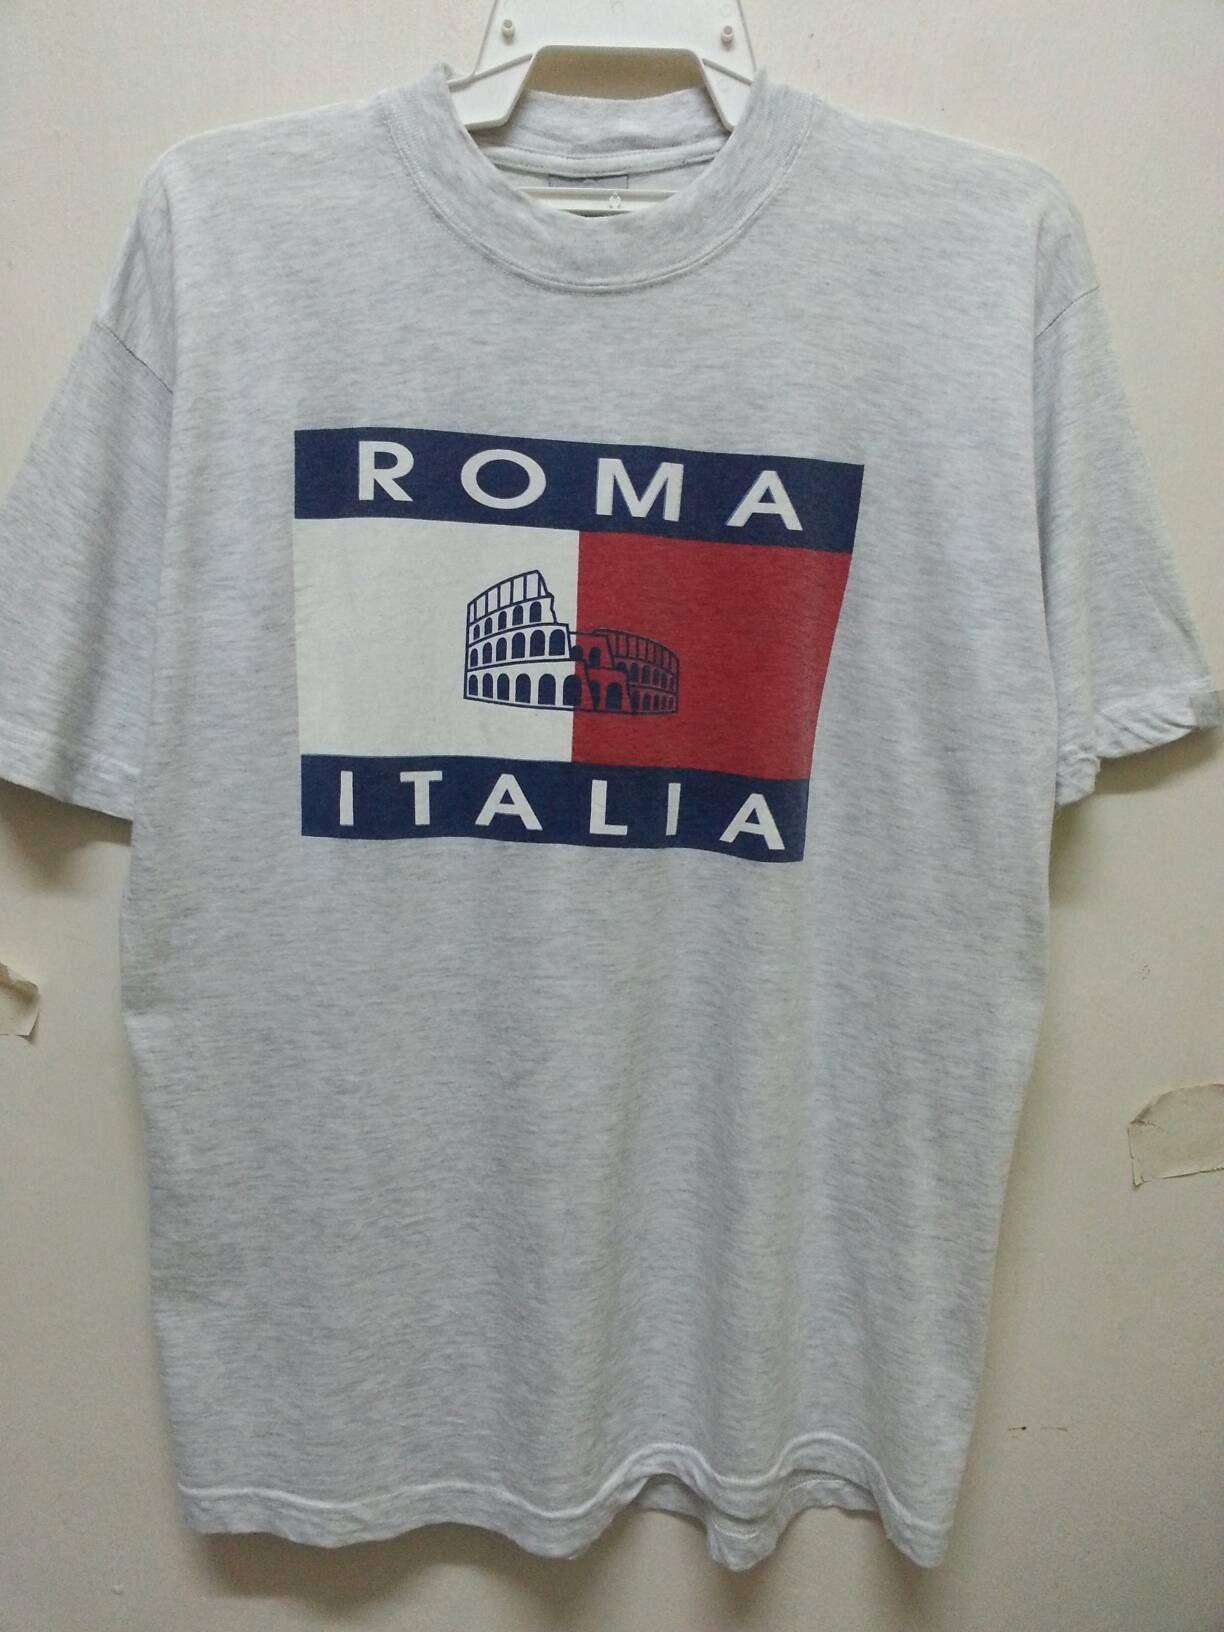 super popular 2fce5 55c45 Vintage 90s Roma Italia Tommy Hilfiger Parody Souviner T-Shirts Large Size  Fit Medium